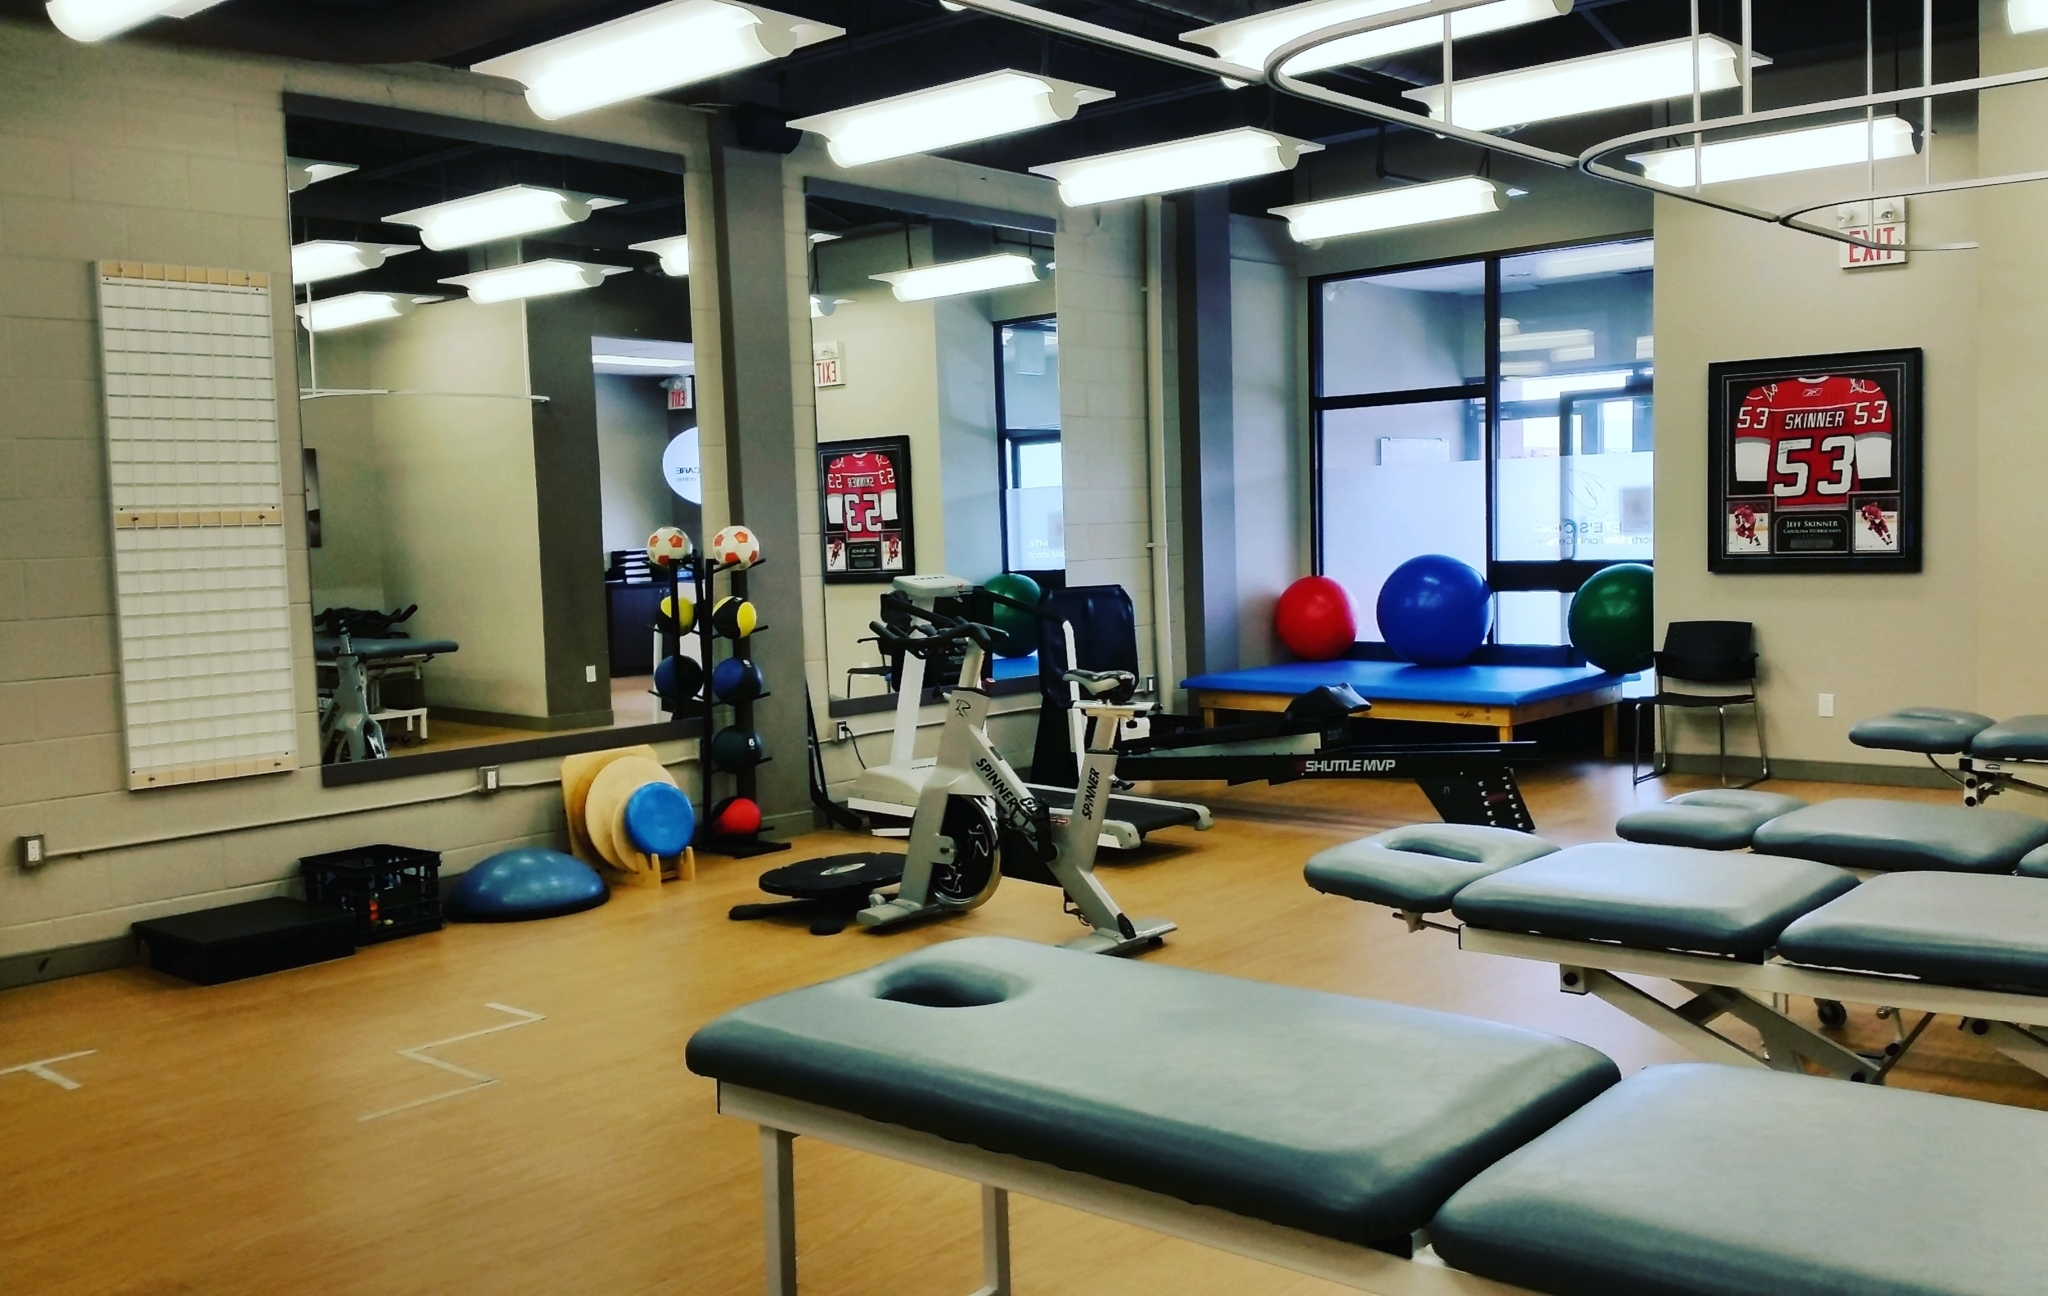 Athlete's Care Sports Medicine Centres - Vaughan, ON L6A 1C6 - (905)303-0760 | ShowMeLocal.com